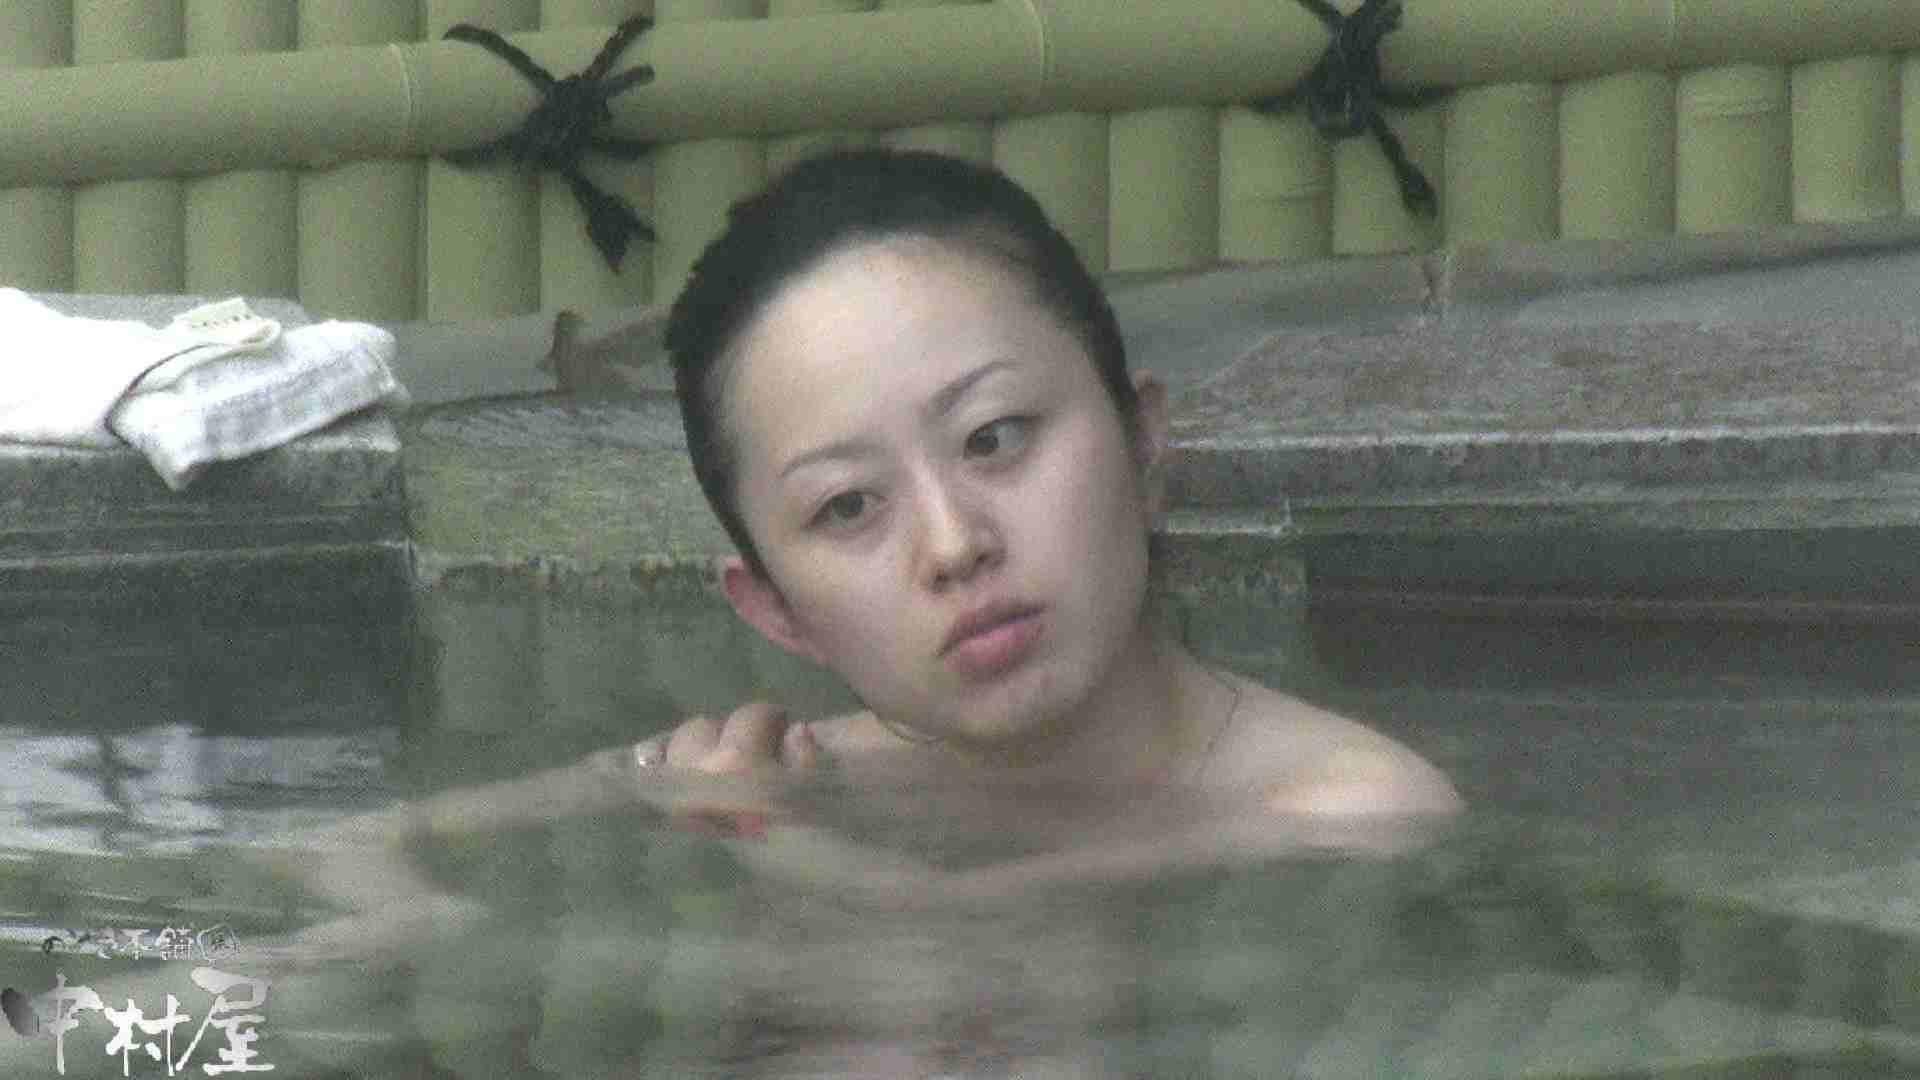 Aquaな露天風呂Vol.912 OLセックス  62画像 39